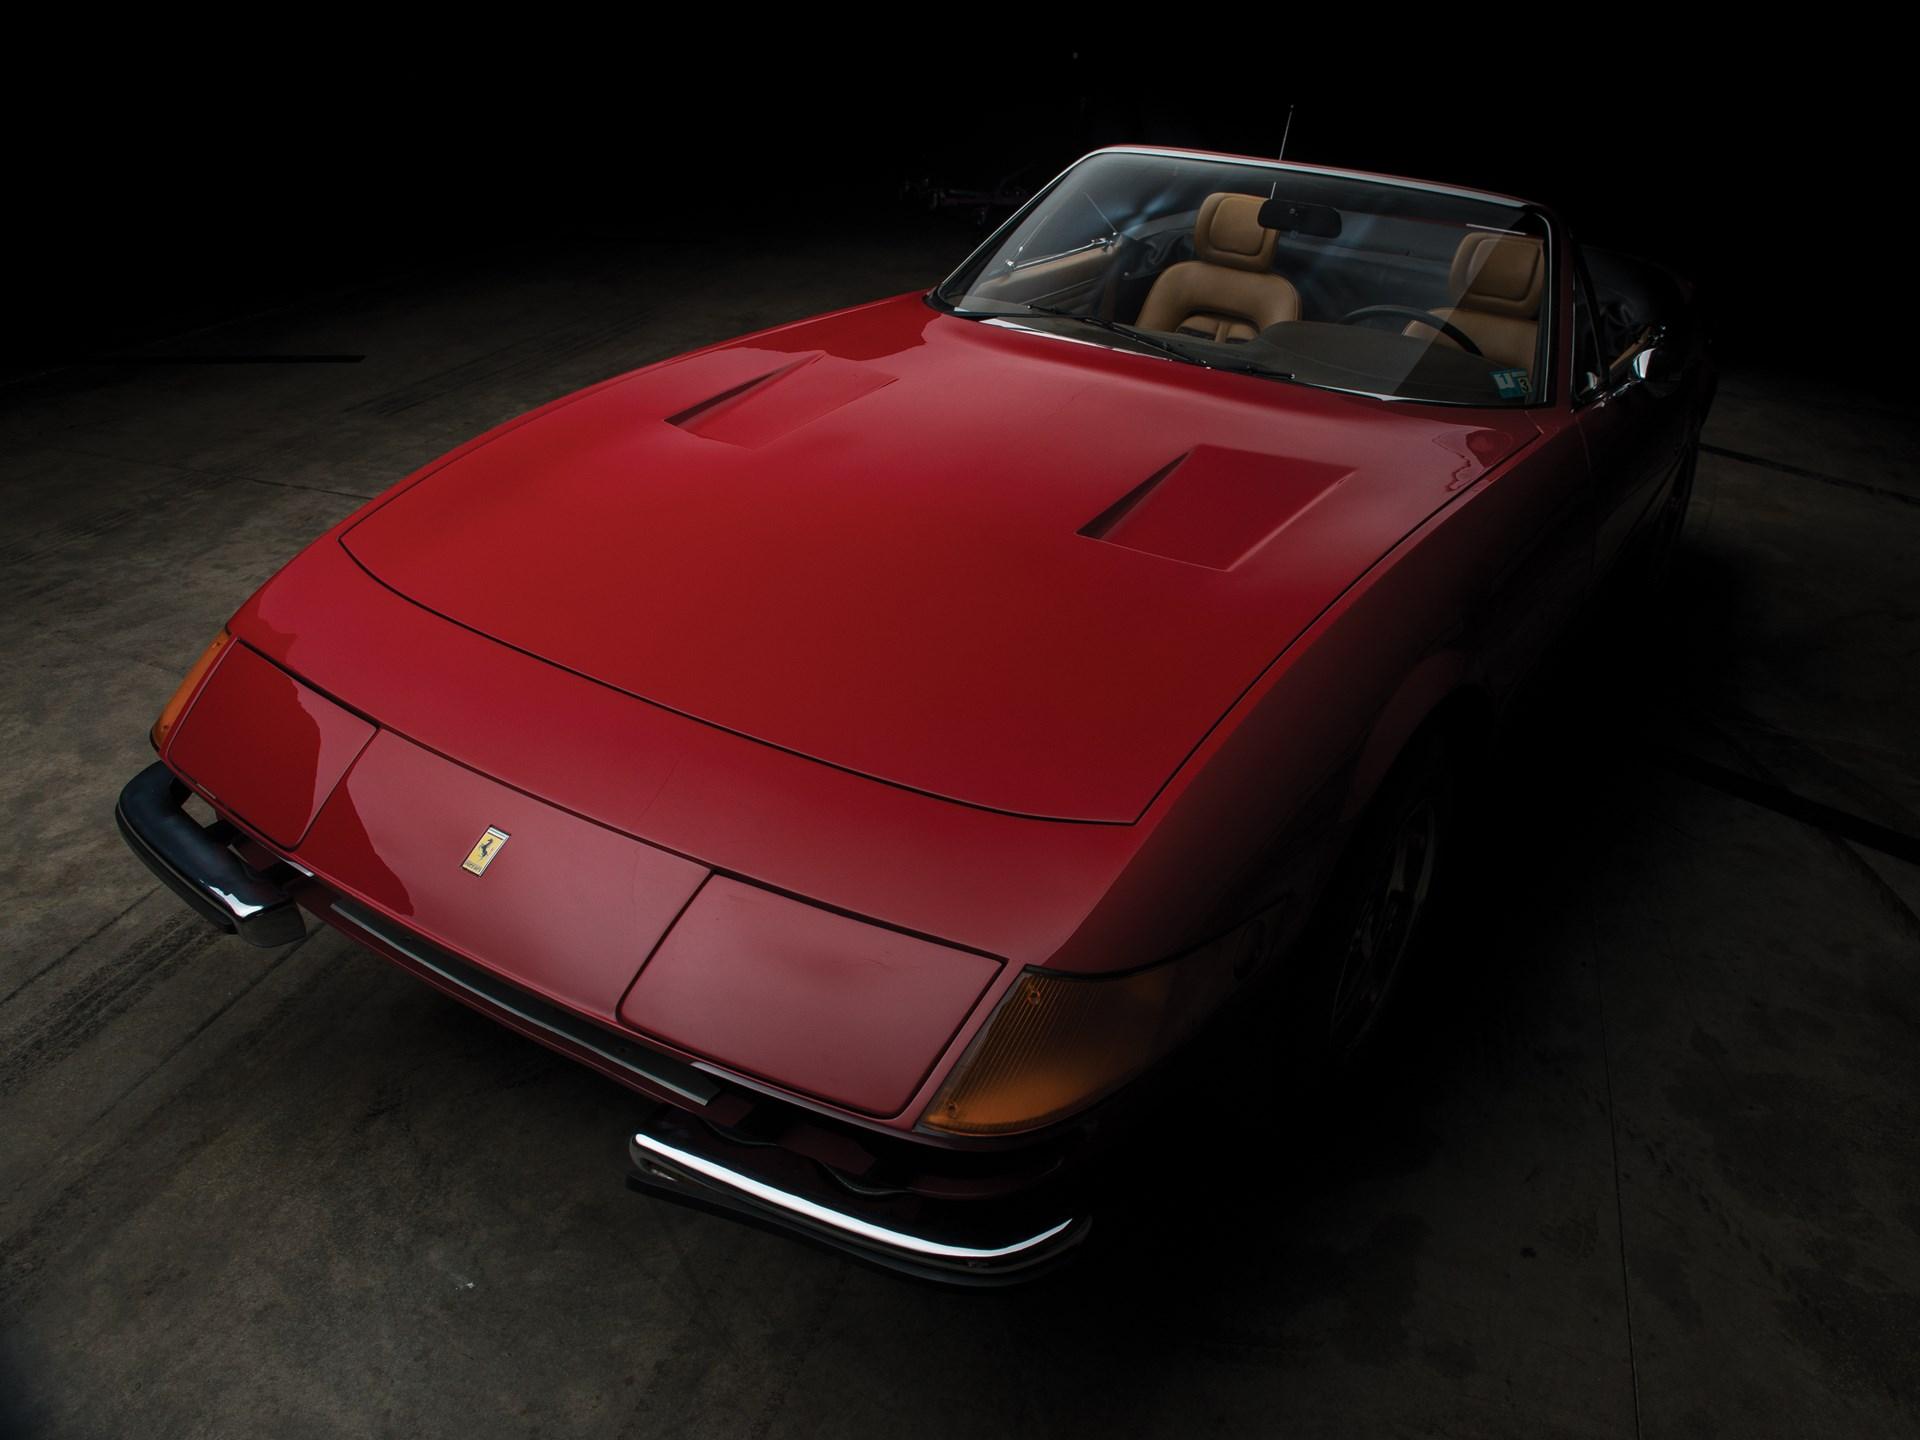 1973 Ferrari 365 GTB/4 Daytona Spider by Scaglietti